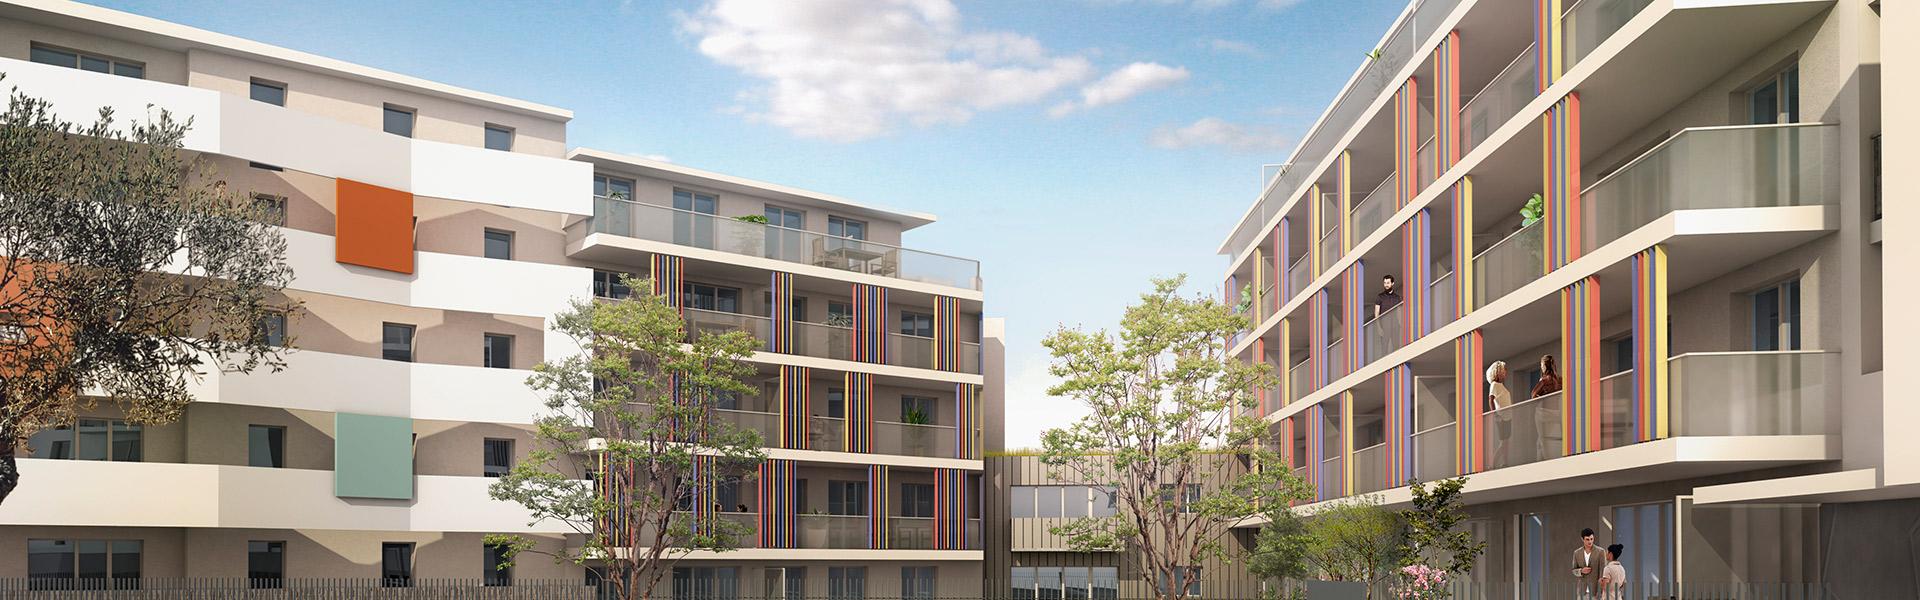 LA-SEYNE-SUR-MER (83) : Nouvelle r�sidence avec jardin